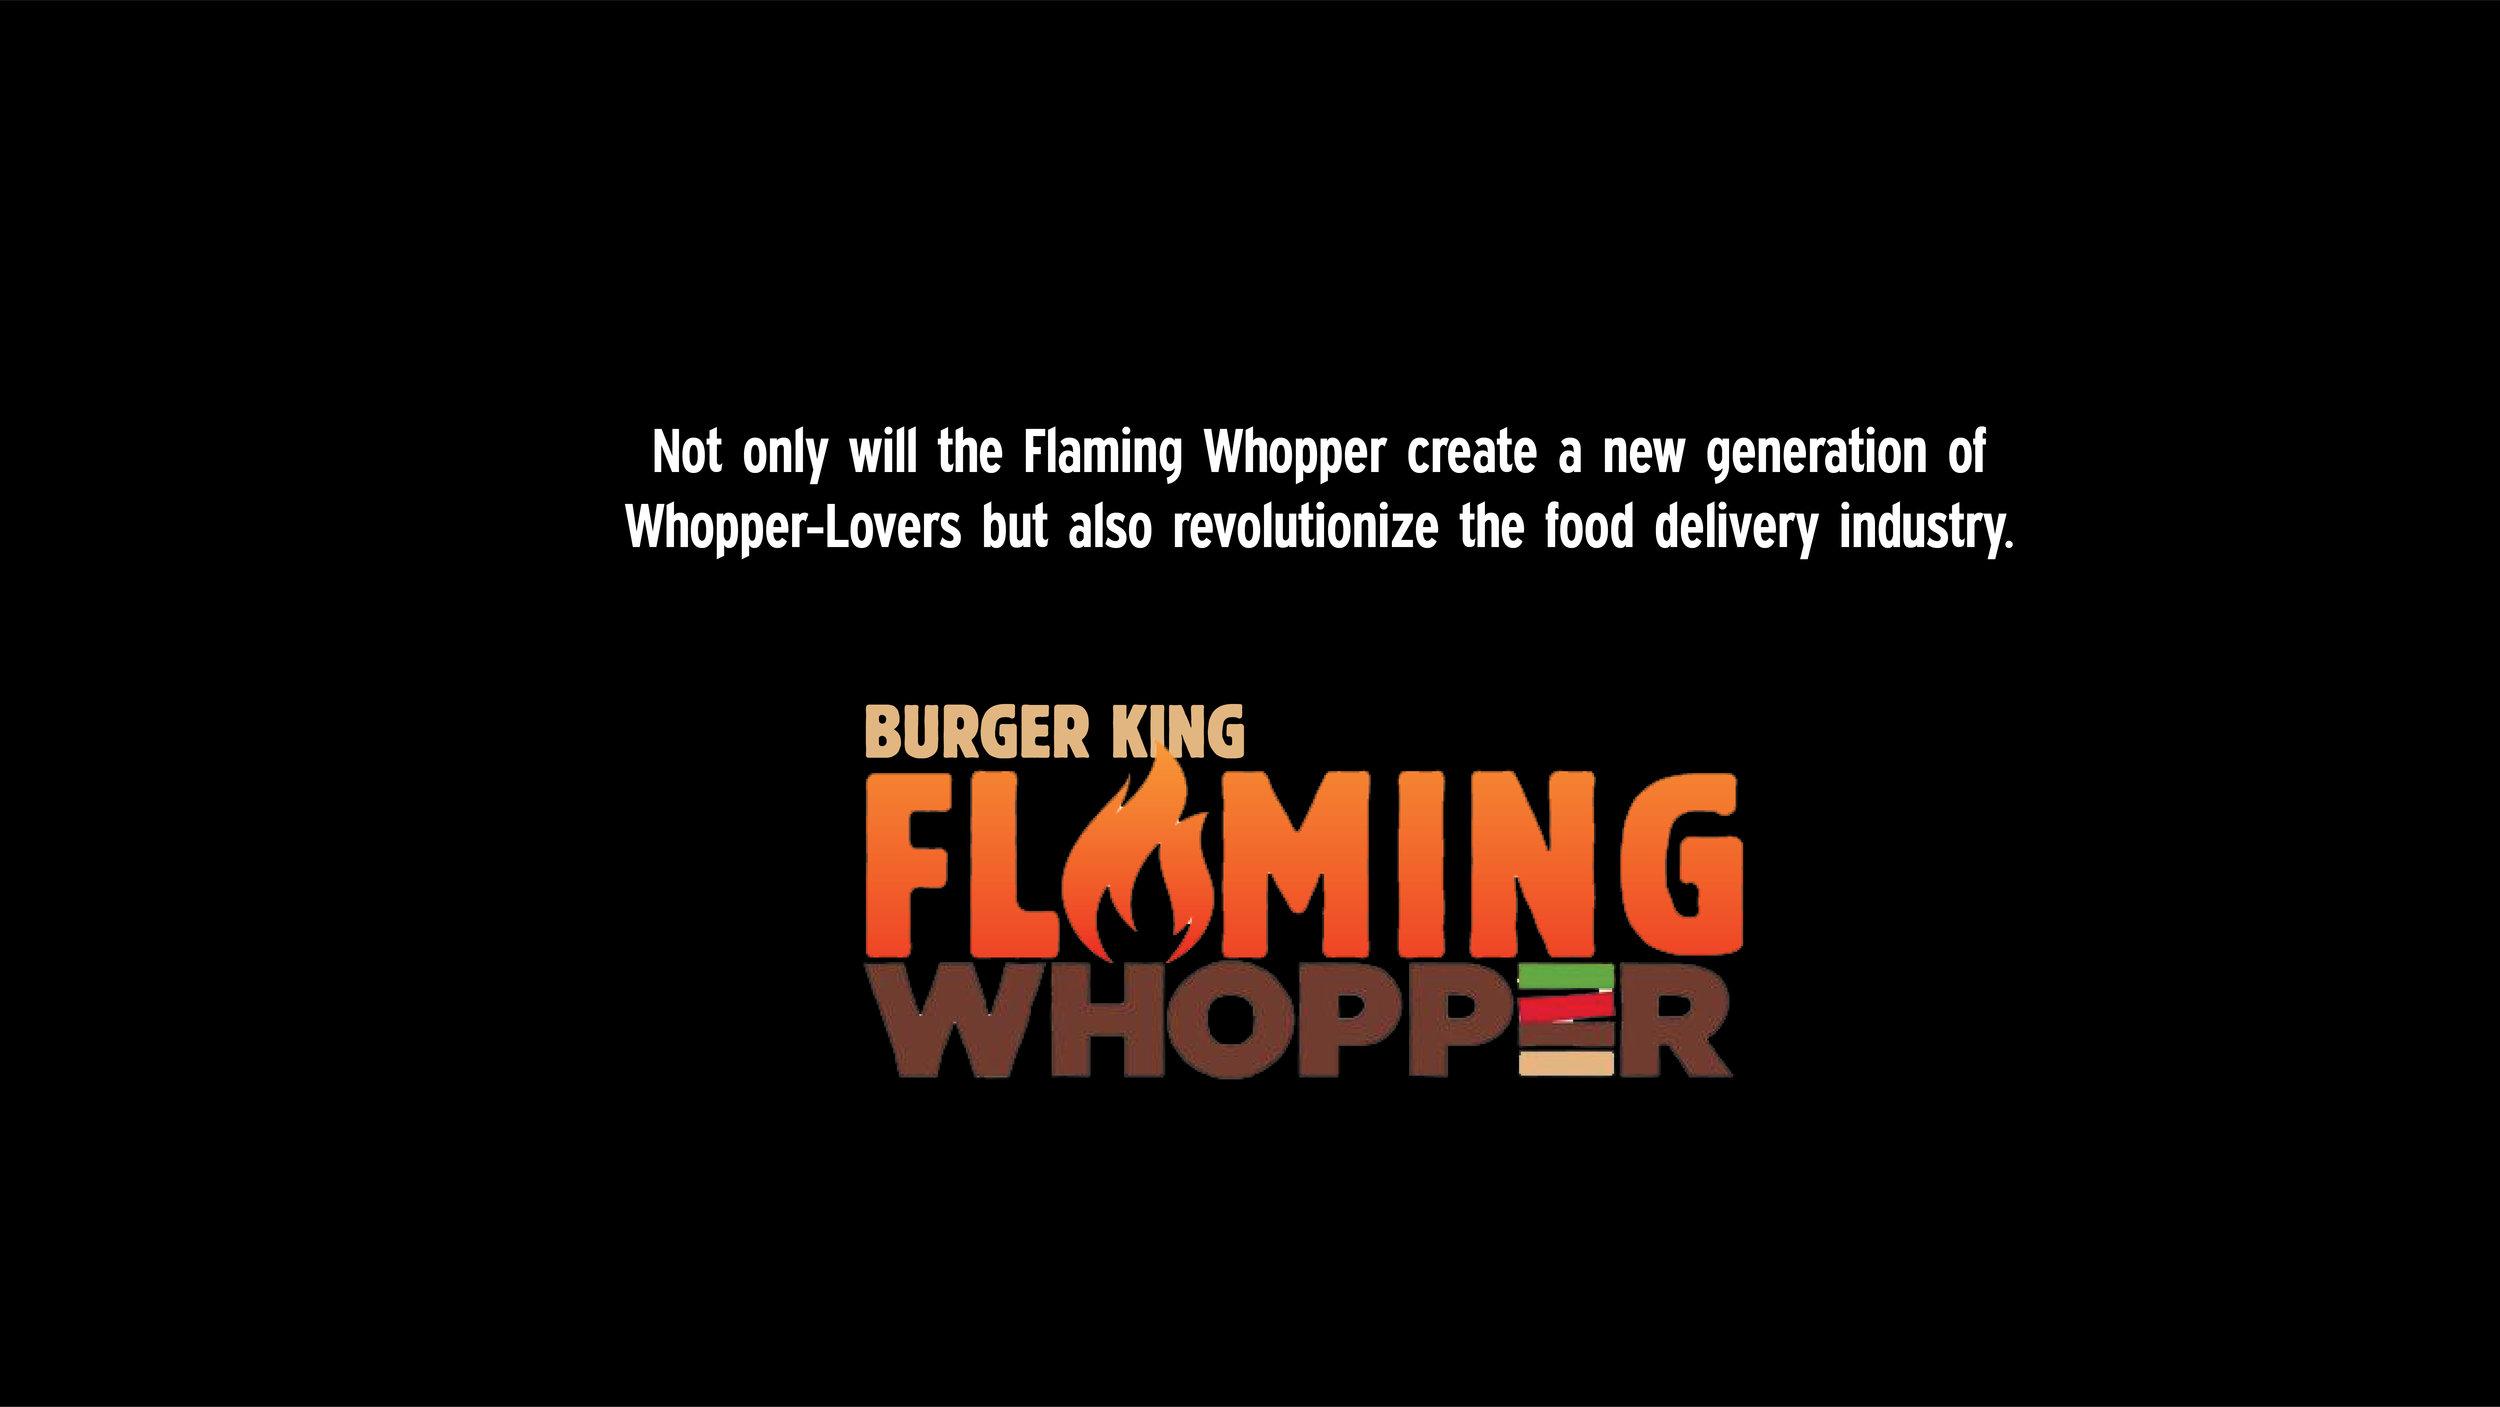 BK Flaming Whopper References-5.jpg